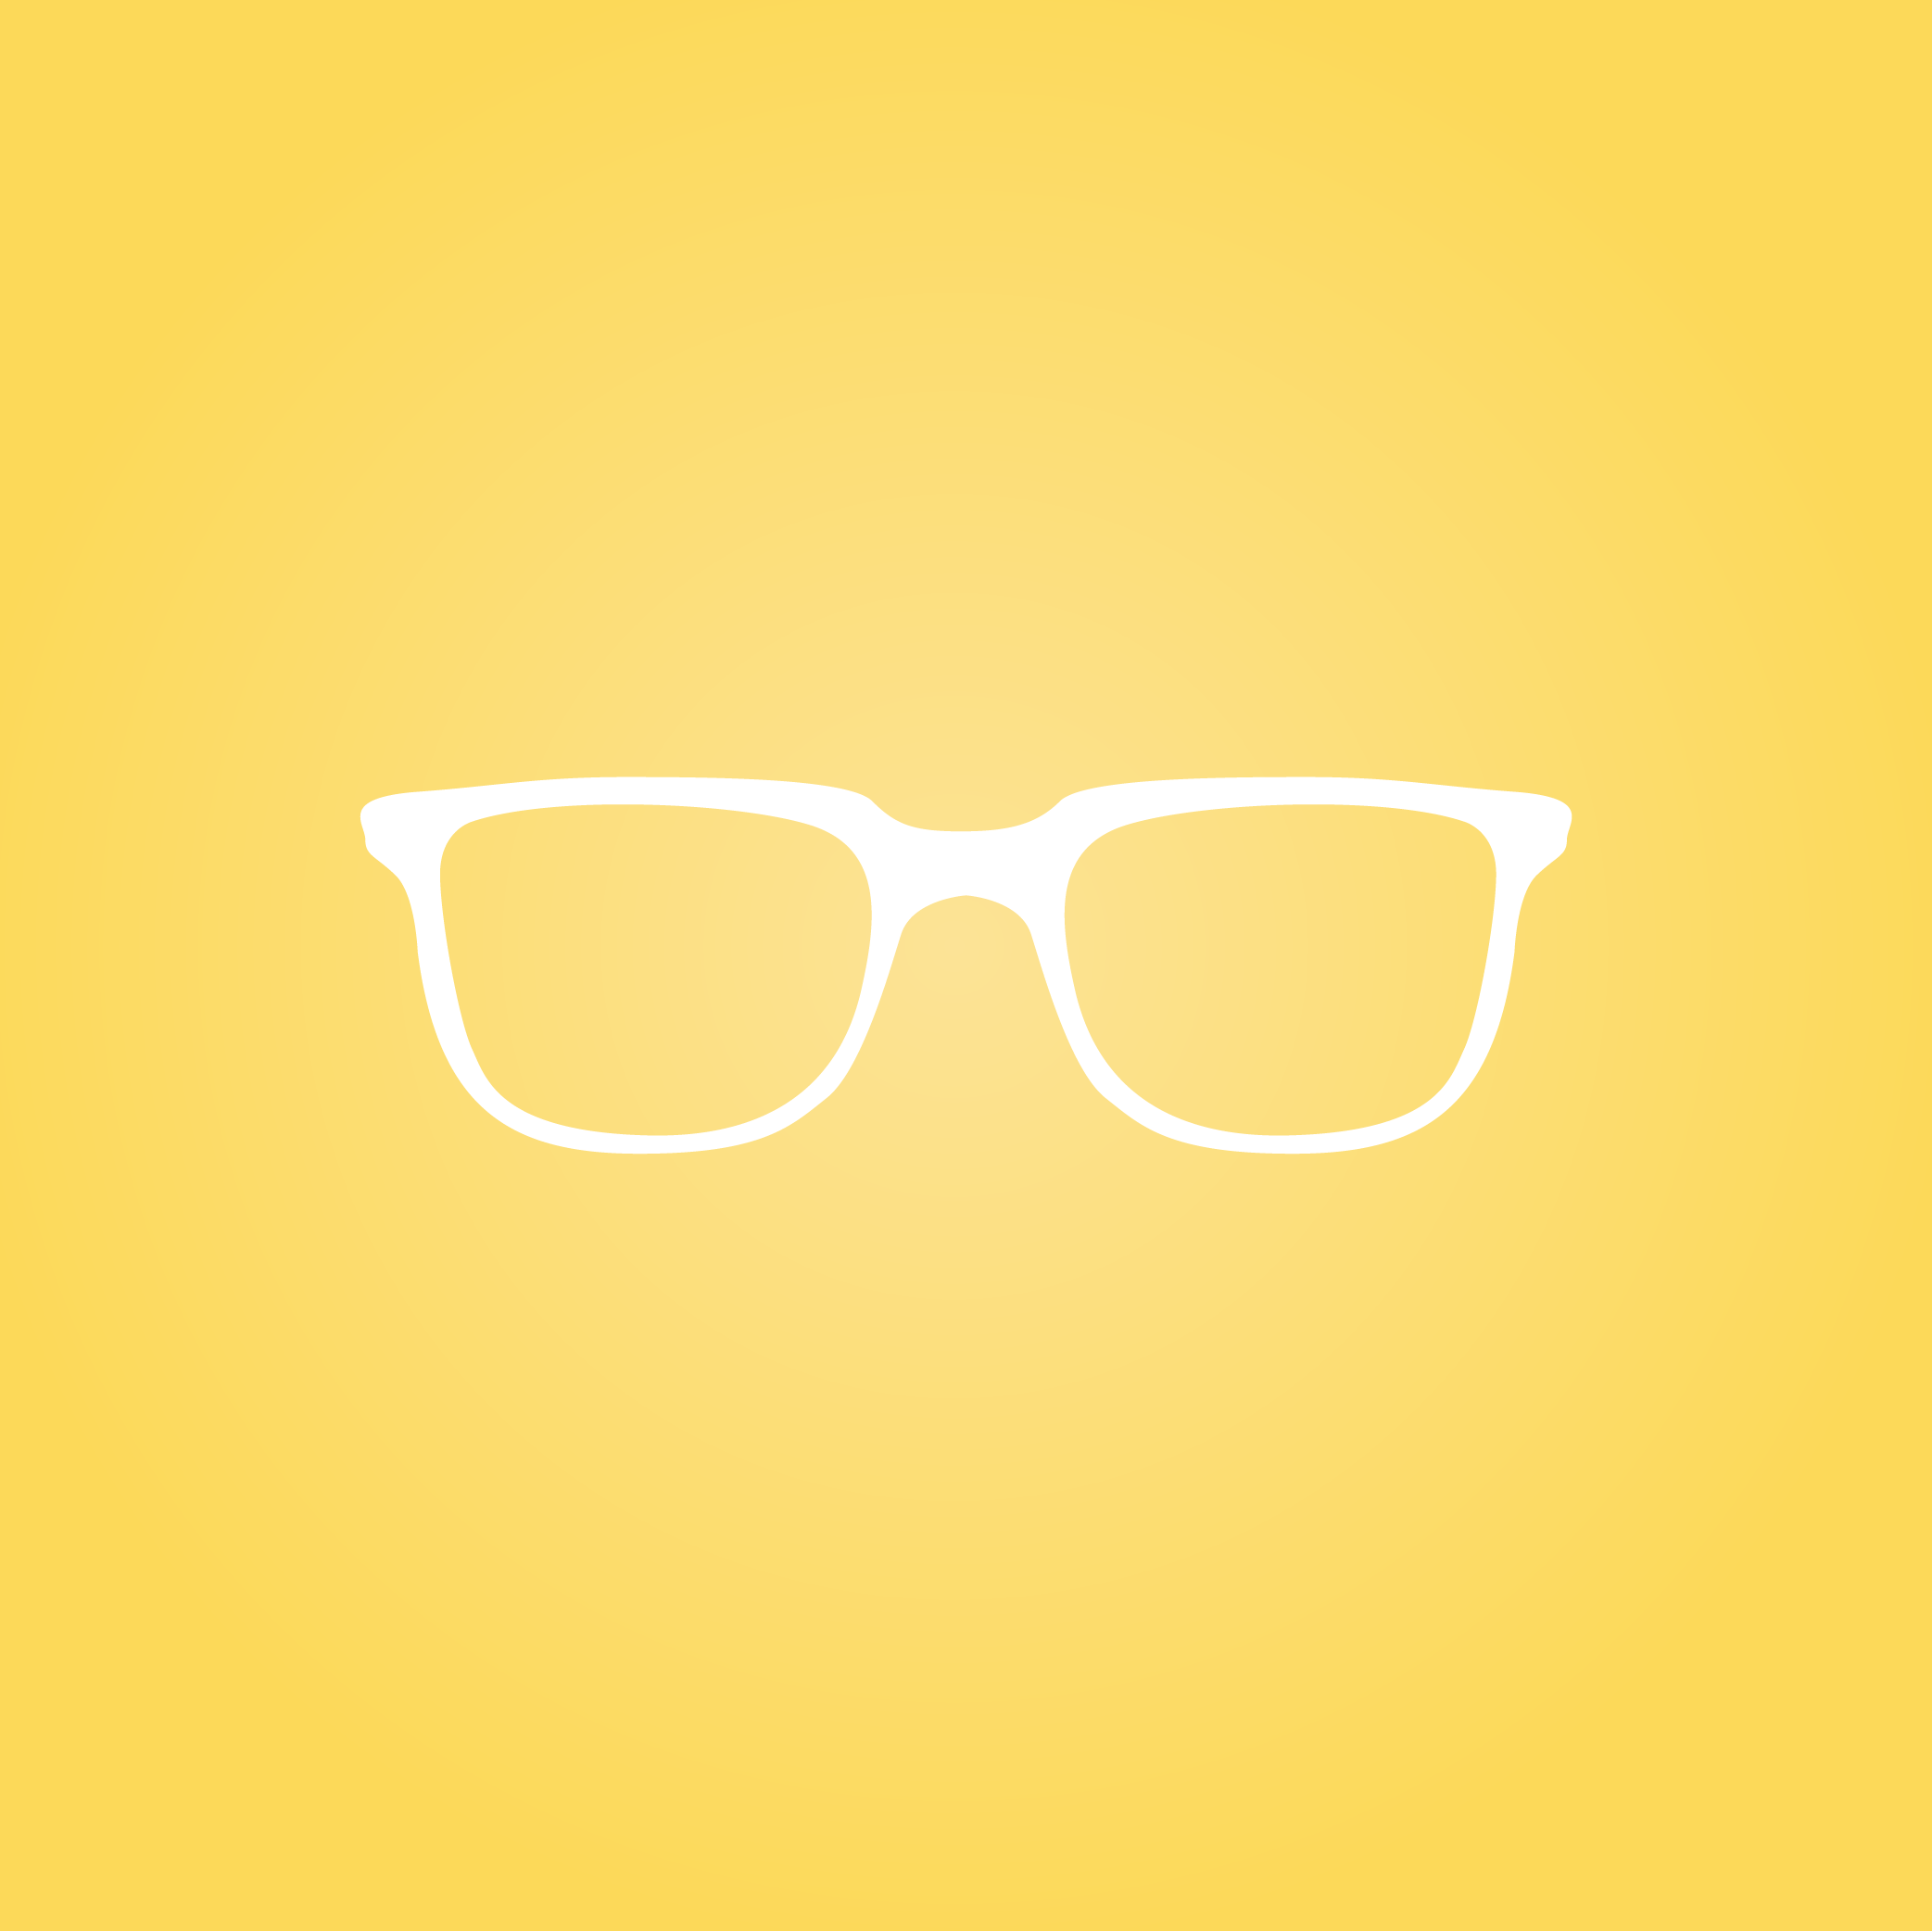 Copy_Buffs_Seth_Godin_Repurpose-01.png